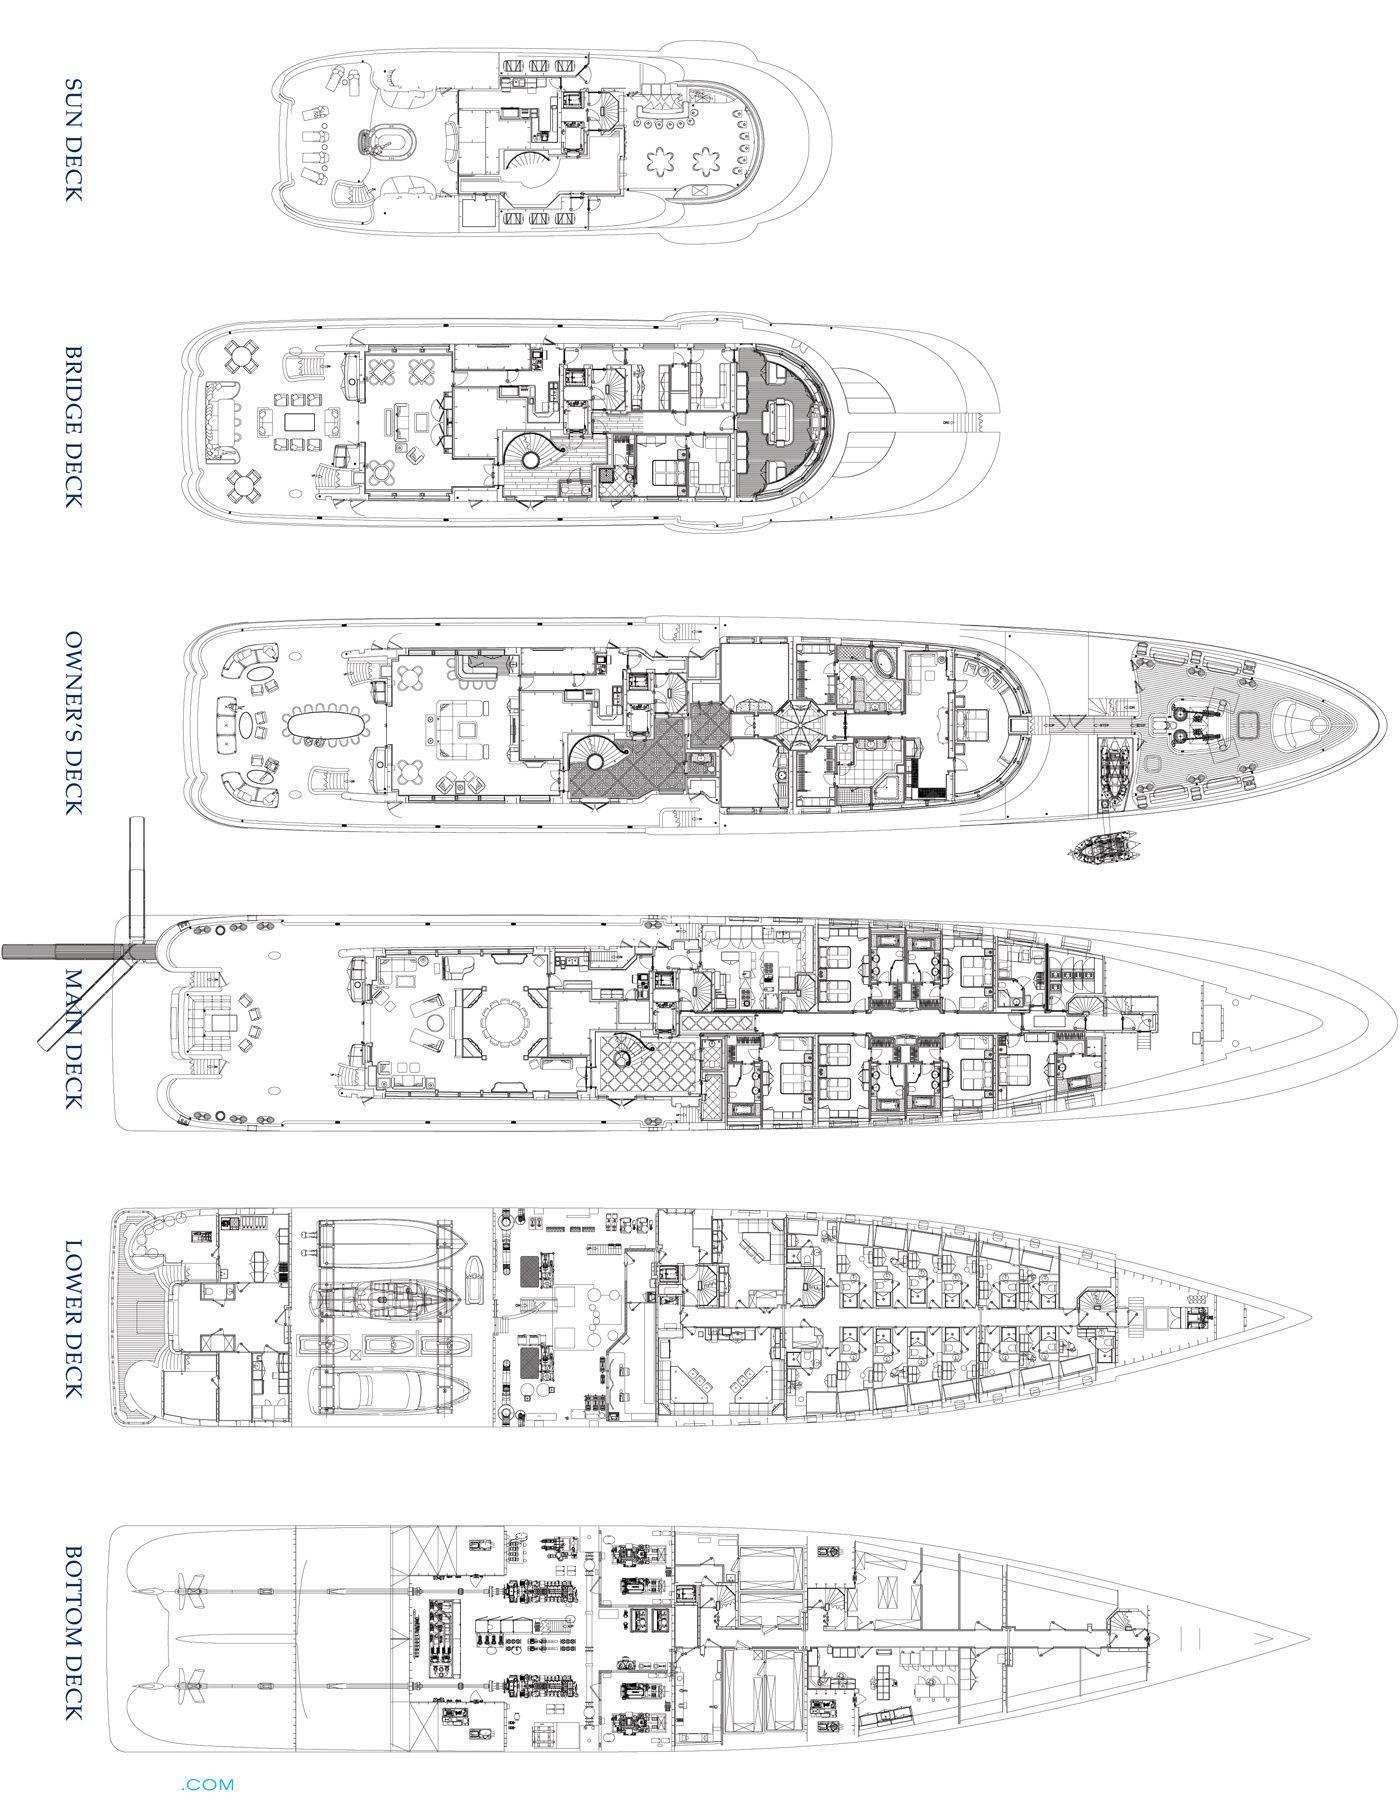 Cakewalk luxury yacht deck plans yachts pinterest for Deck plans for sale